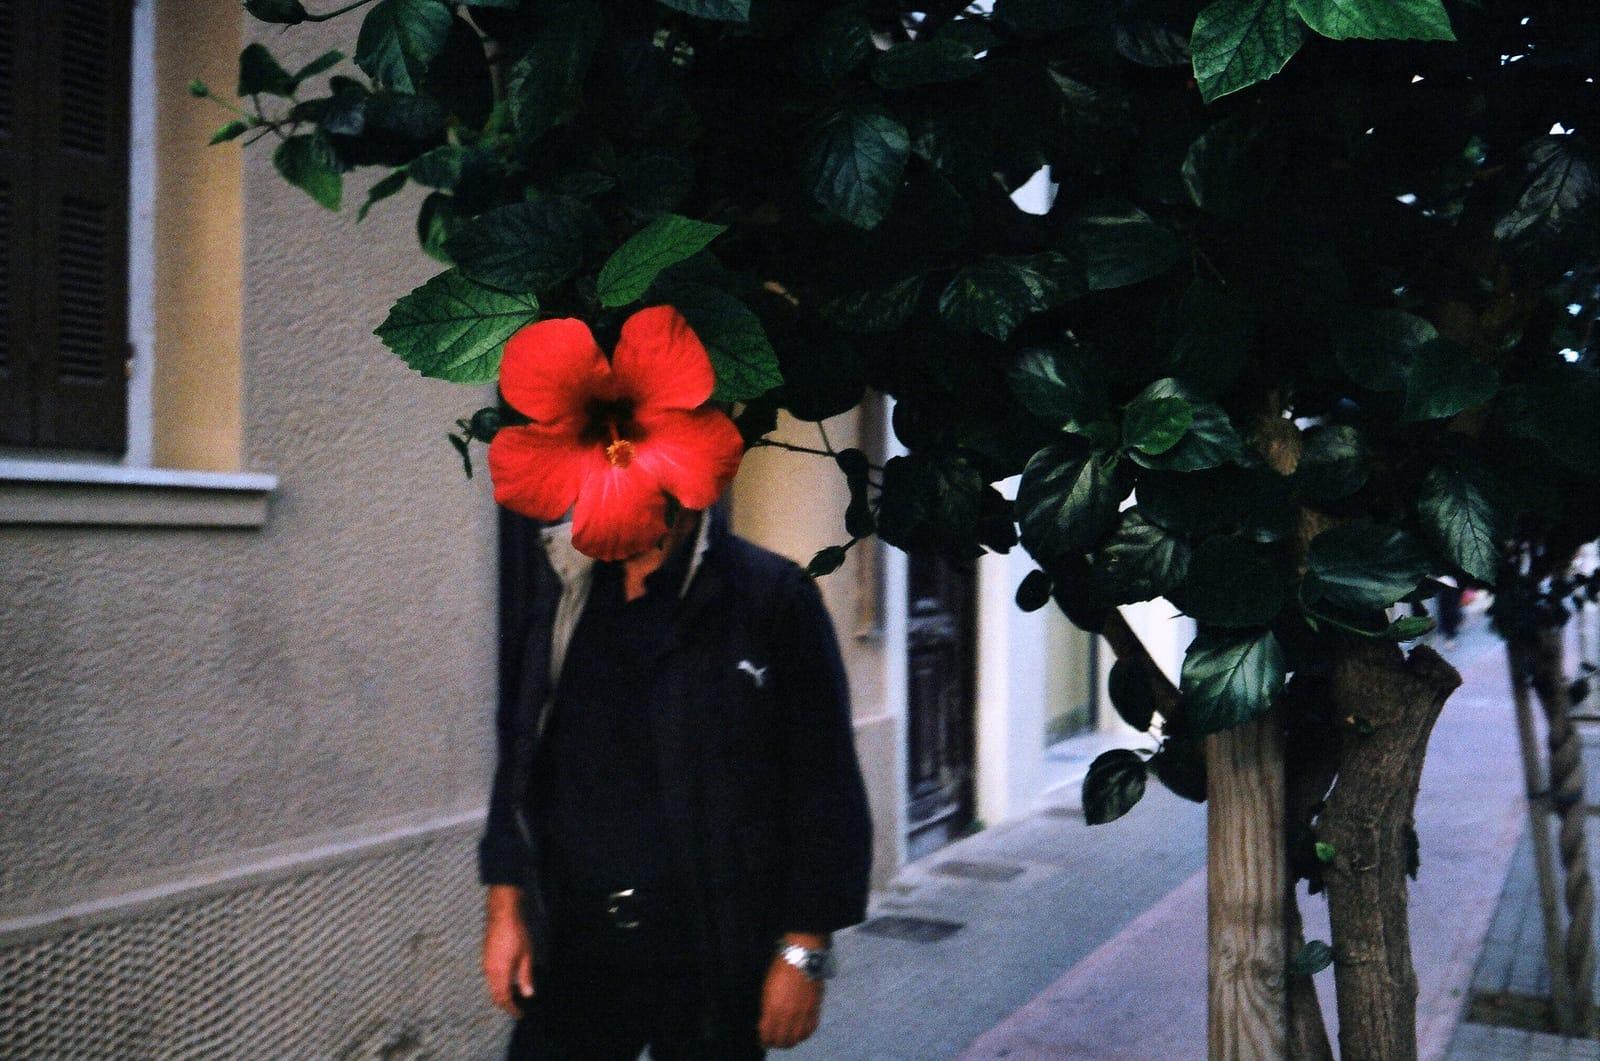 Flower Head by Spyros Papaspyropoulos